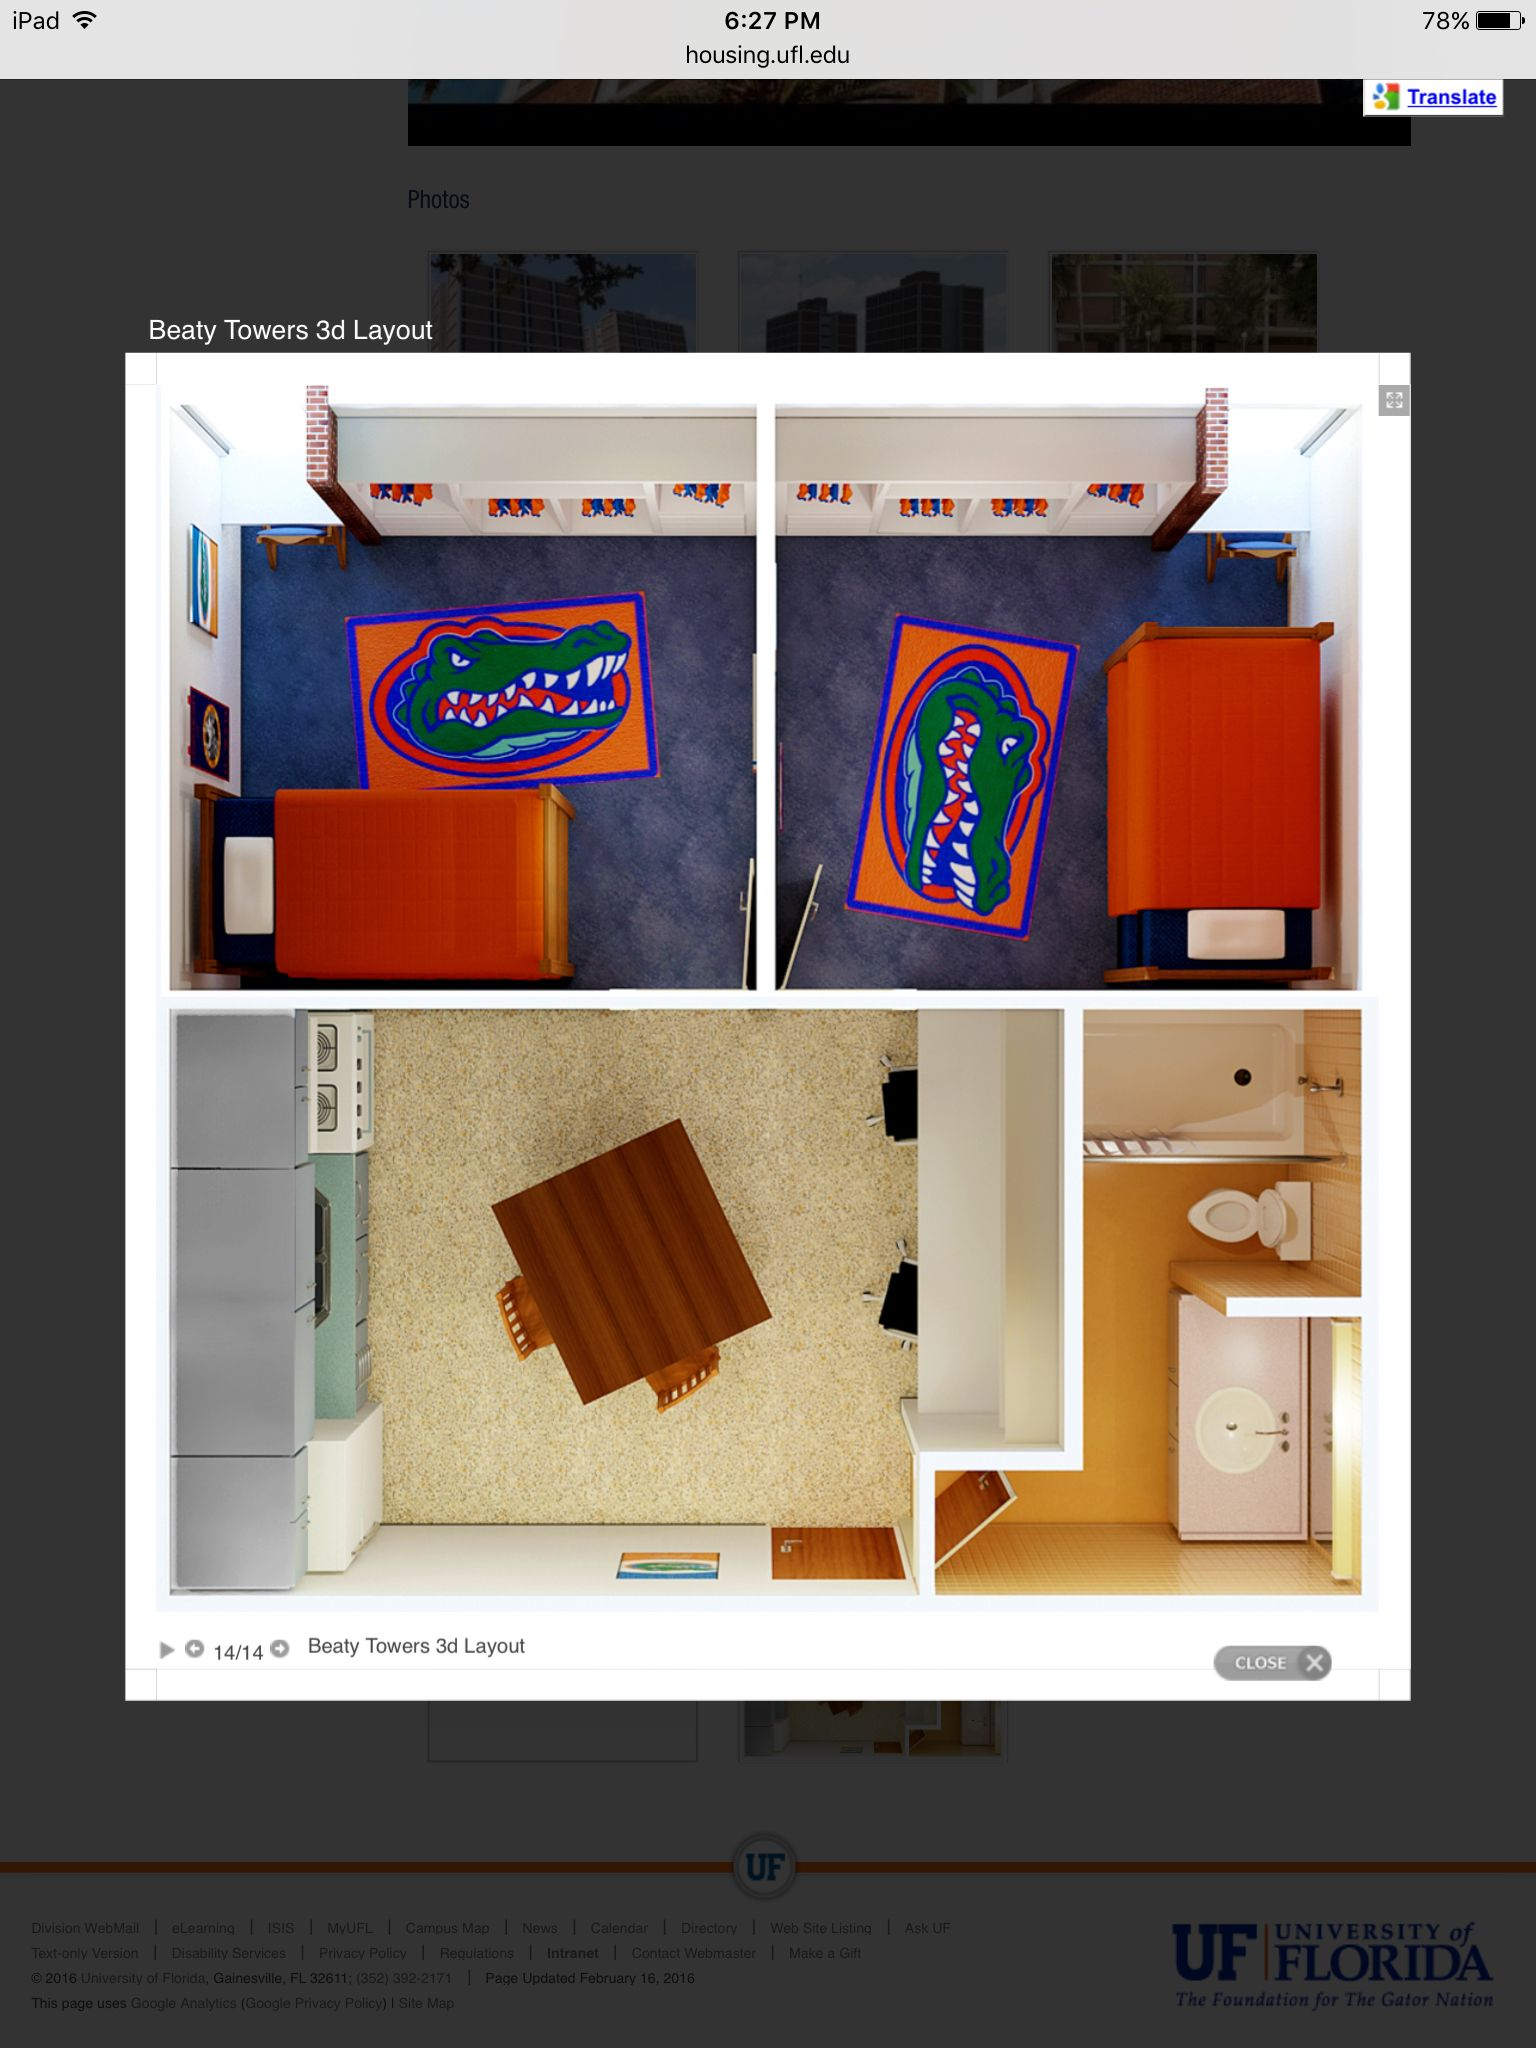 Beaty Towers Uf Florida Gators Dorm Layout Uf Dorm Dorm